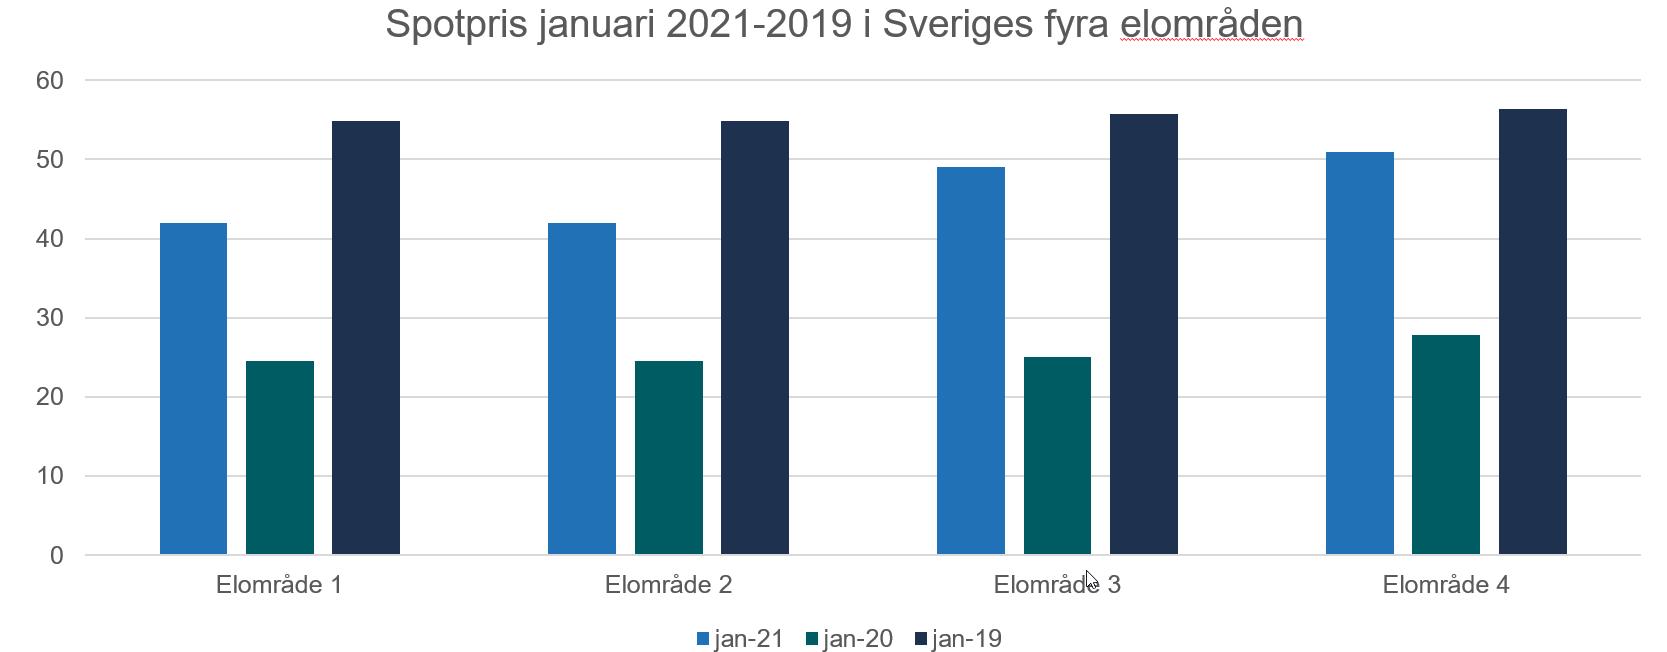 Graf spotpris 2021-2019